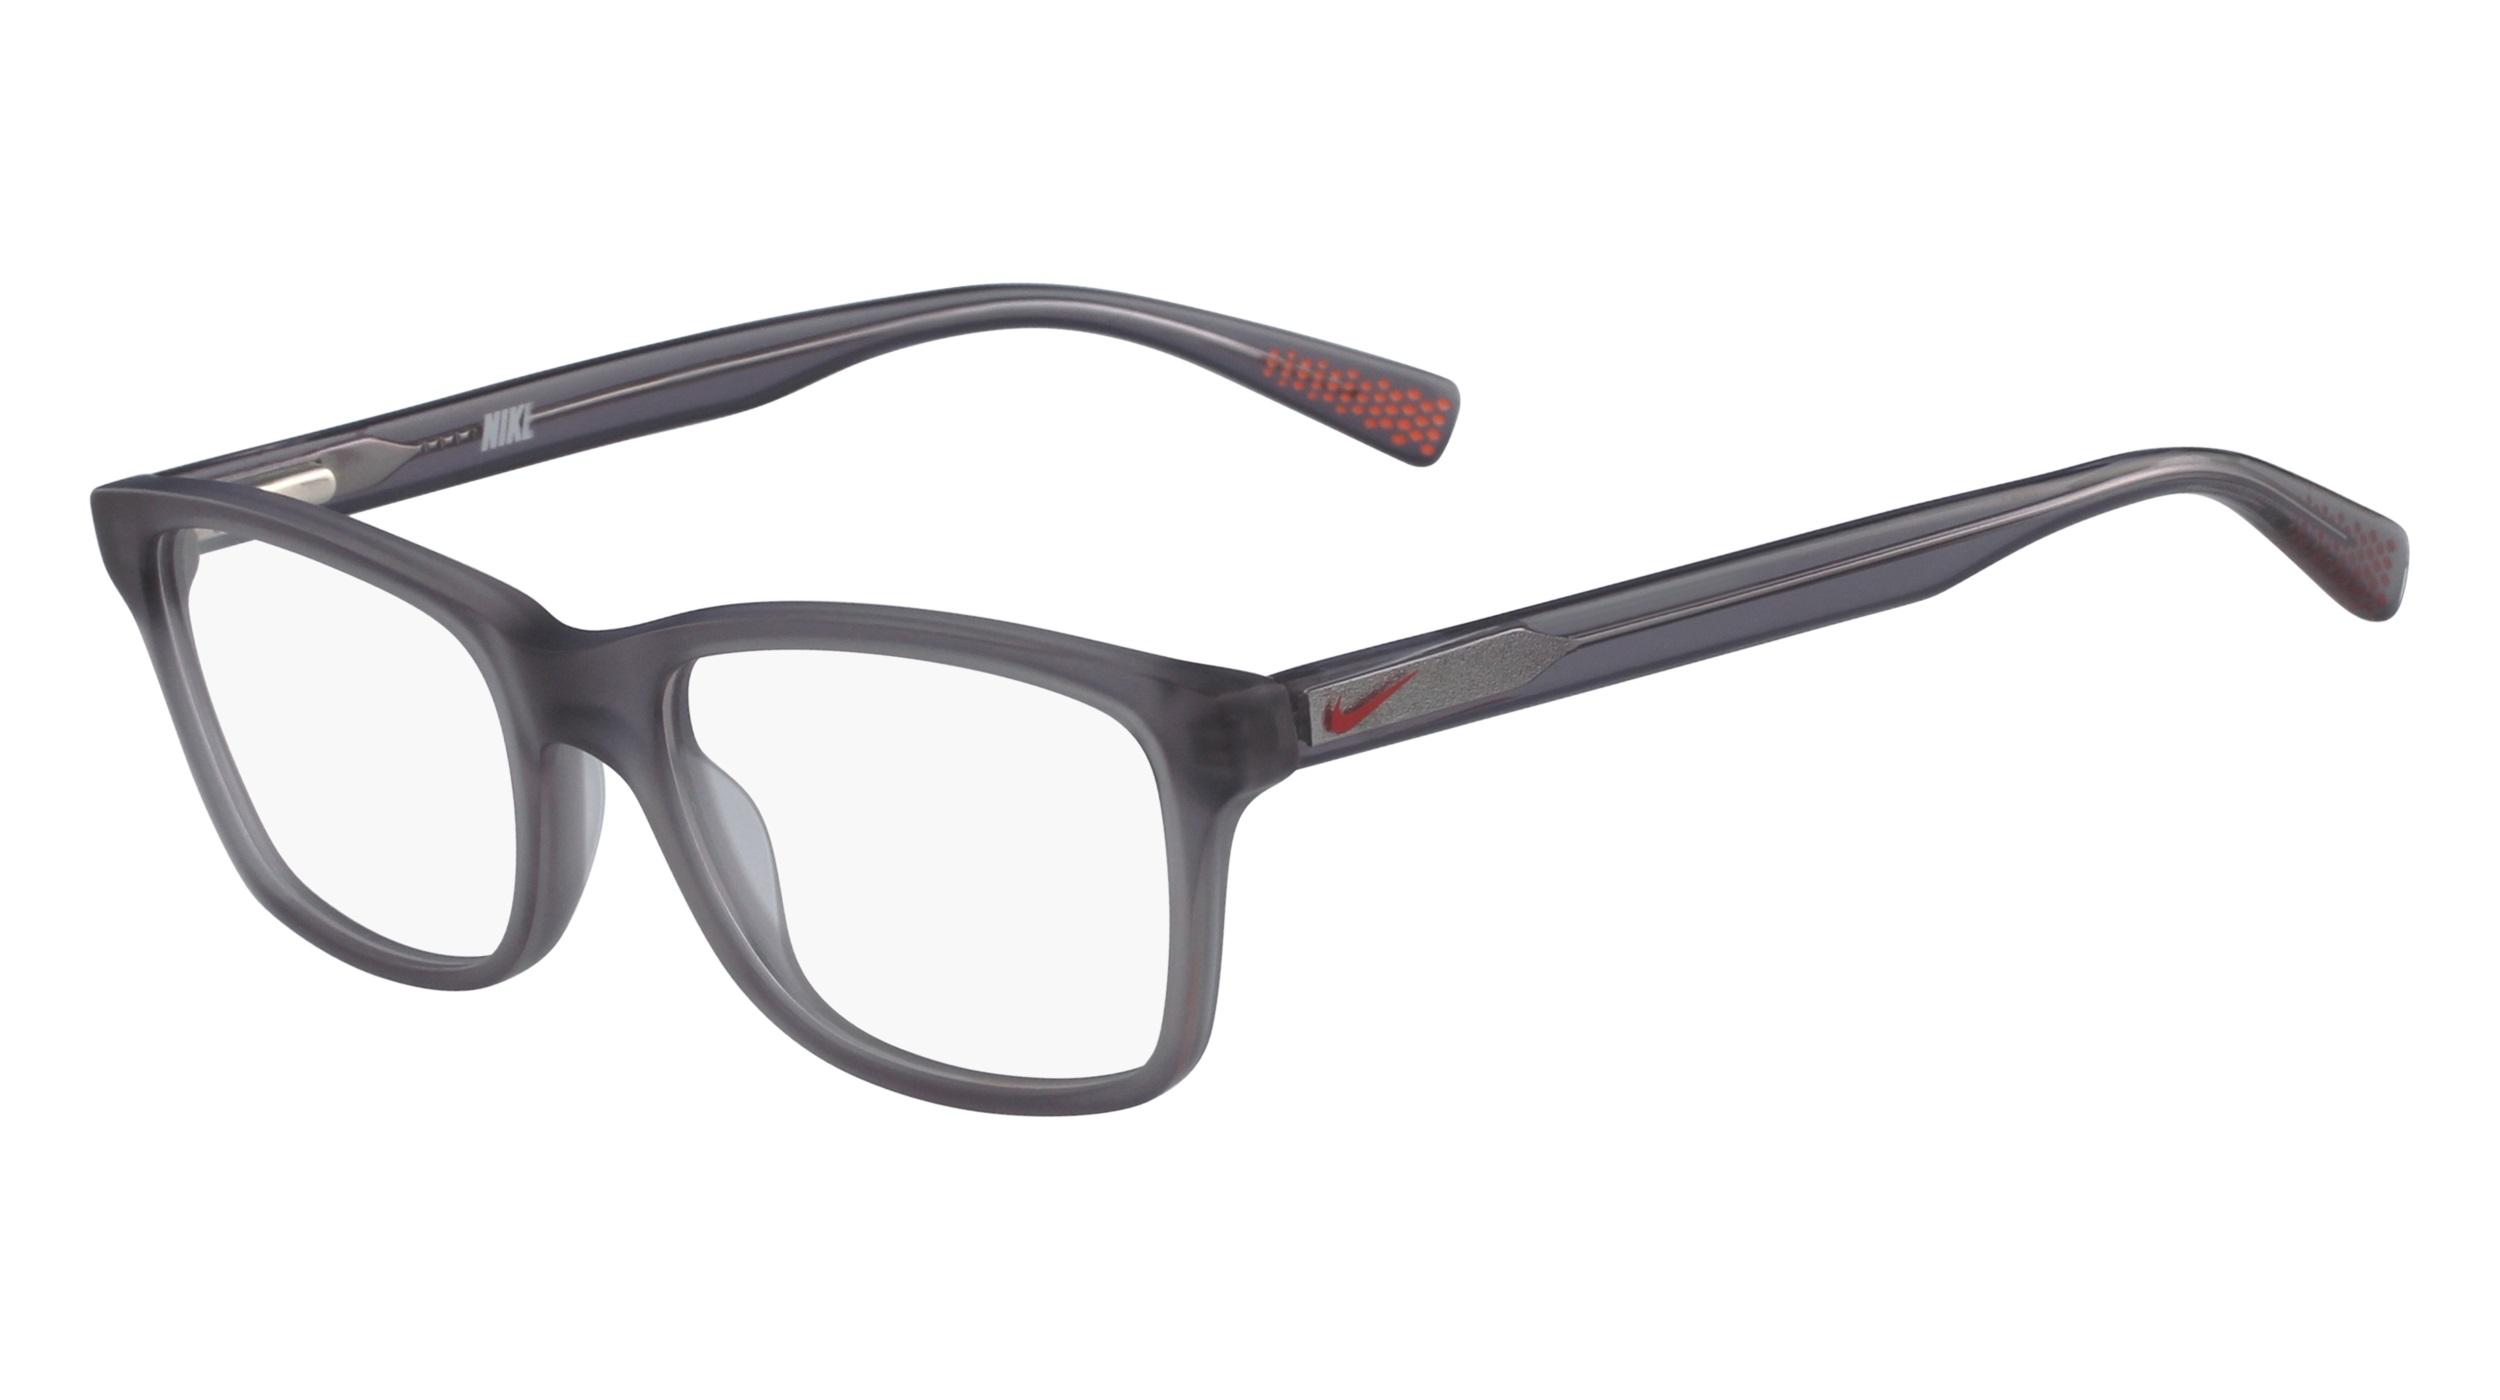 93cde08f90a Nike 5015-259 Kids Eyeglasses Anthracite Nike5015-259 - Optiwow